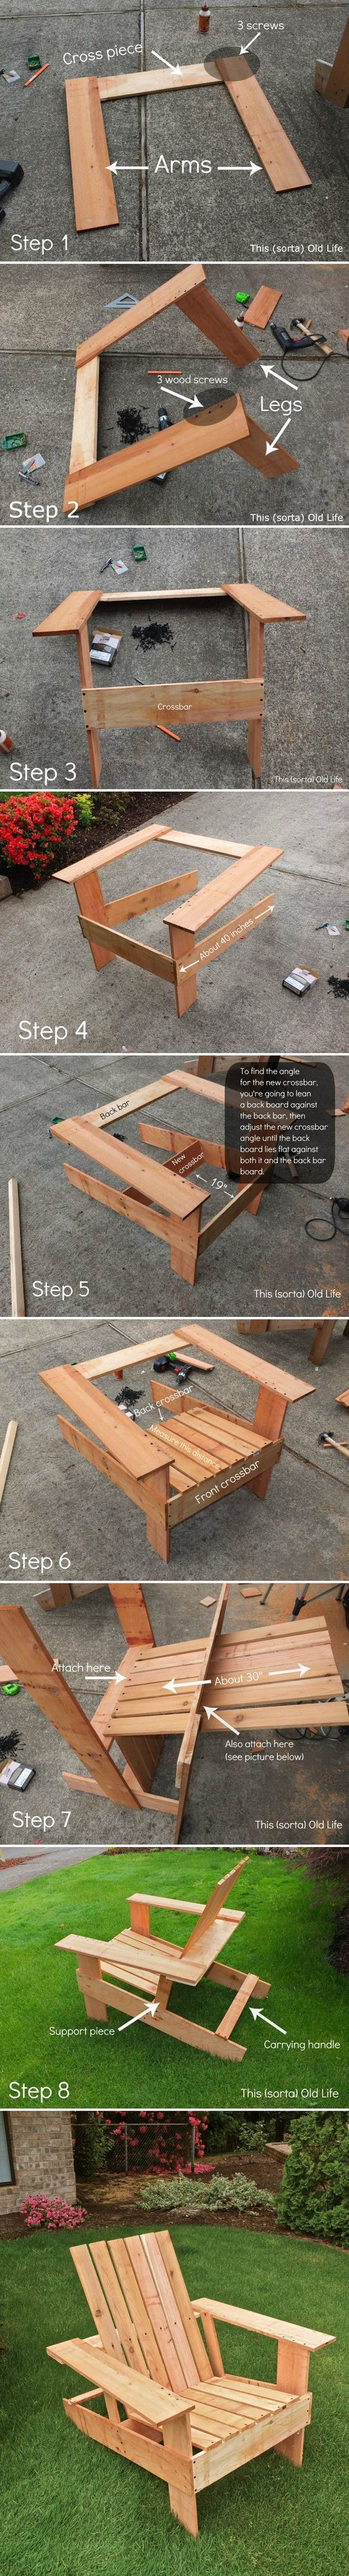 DIY Adirondack Chair Tutorial: